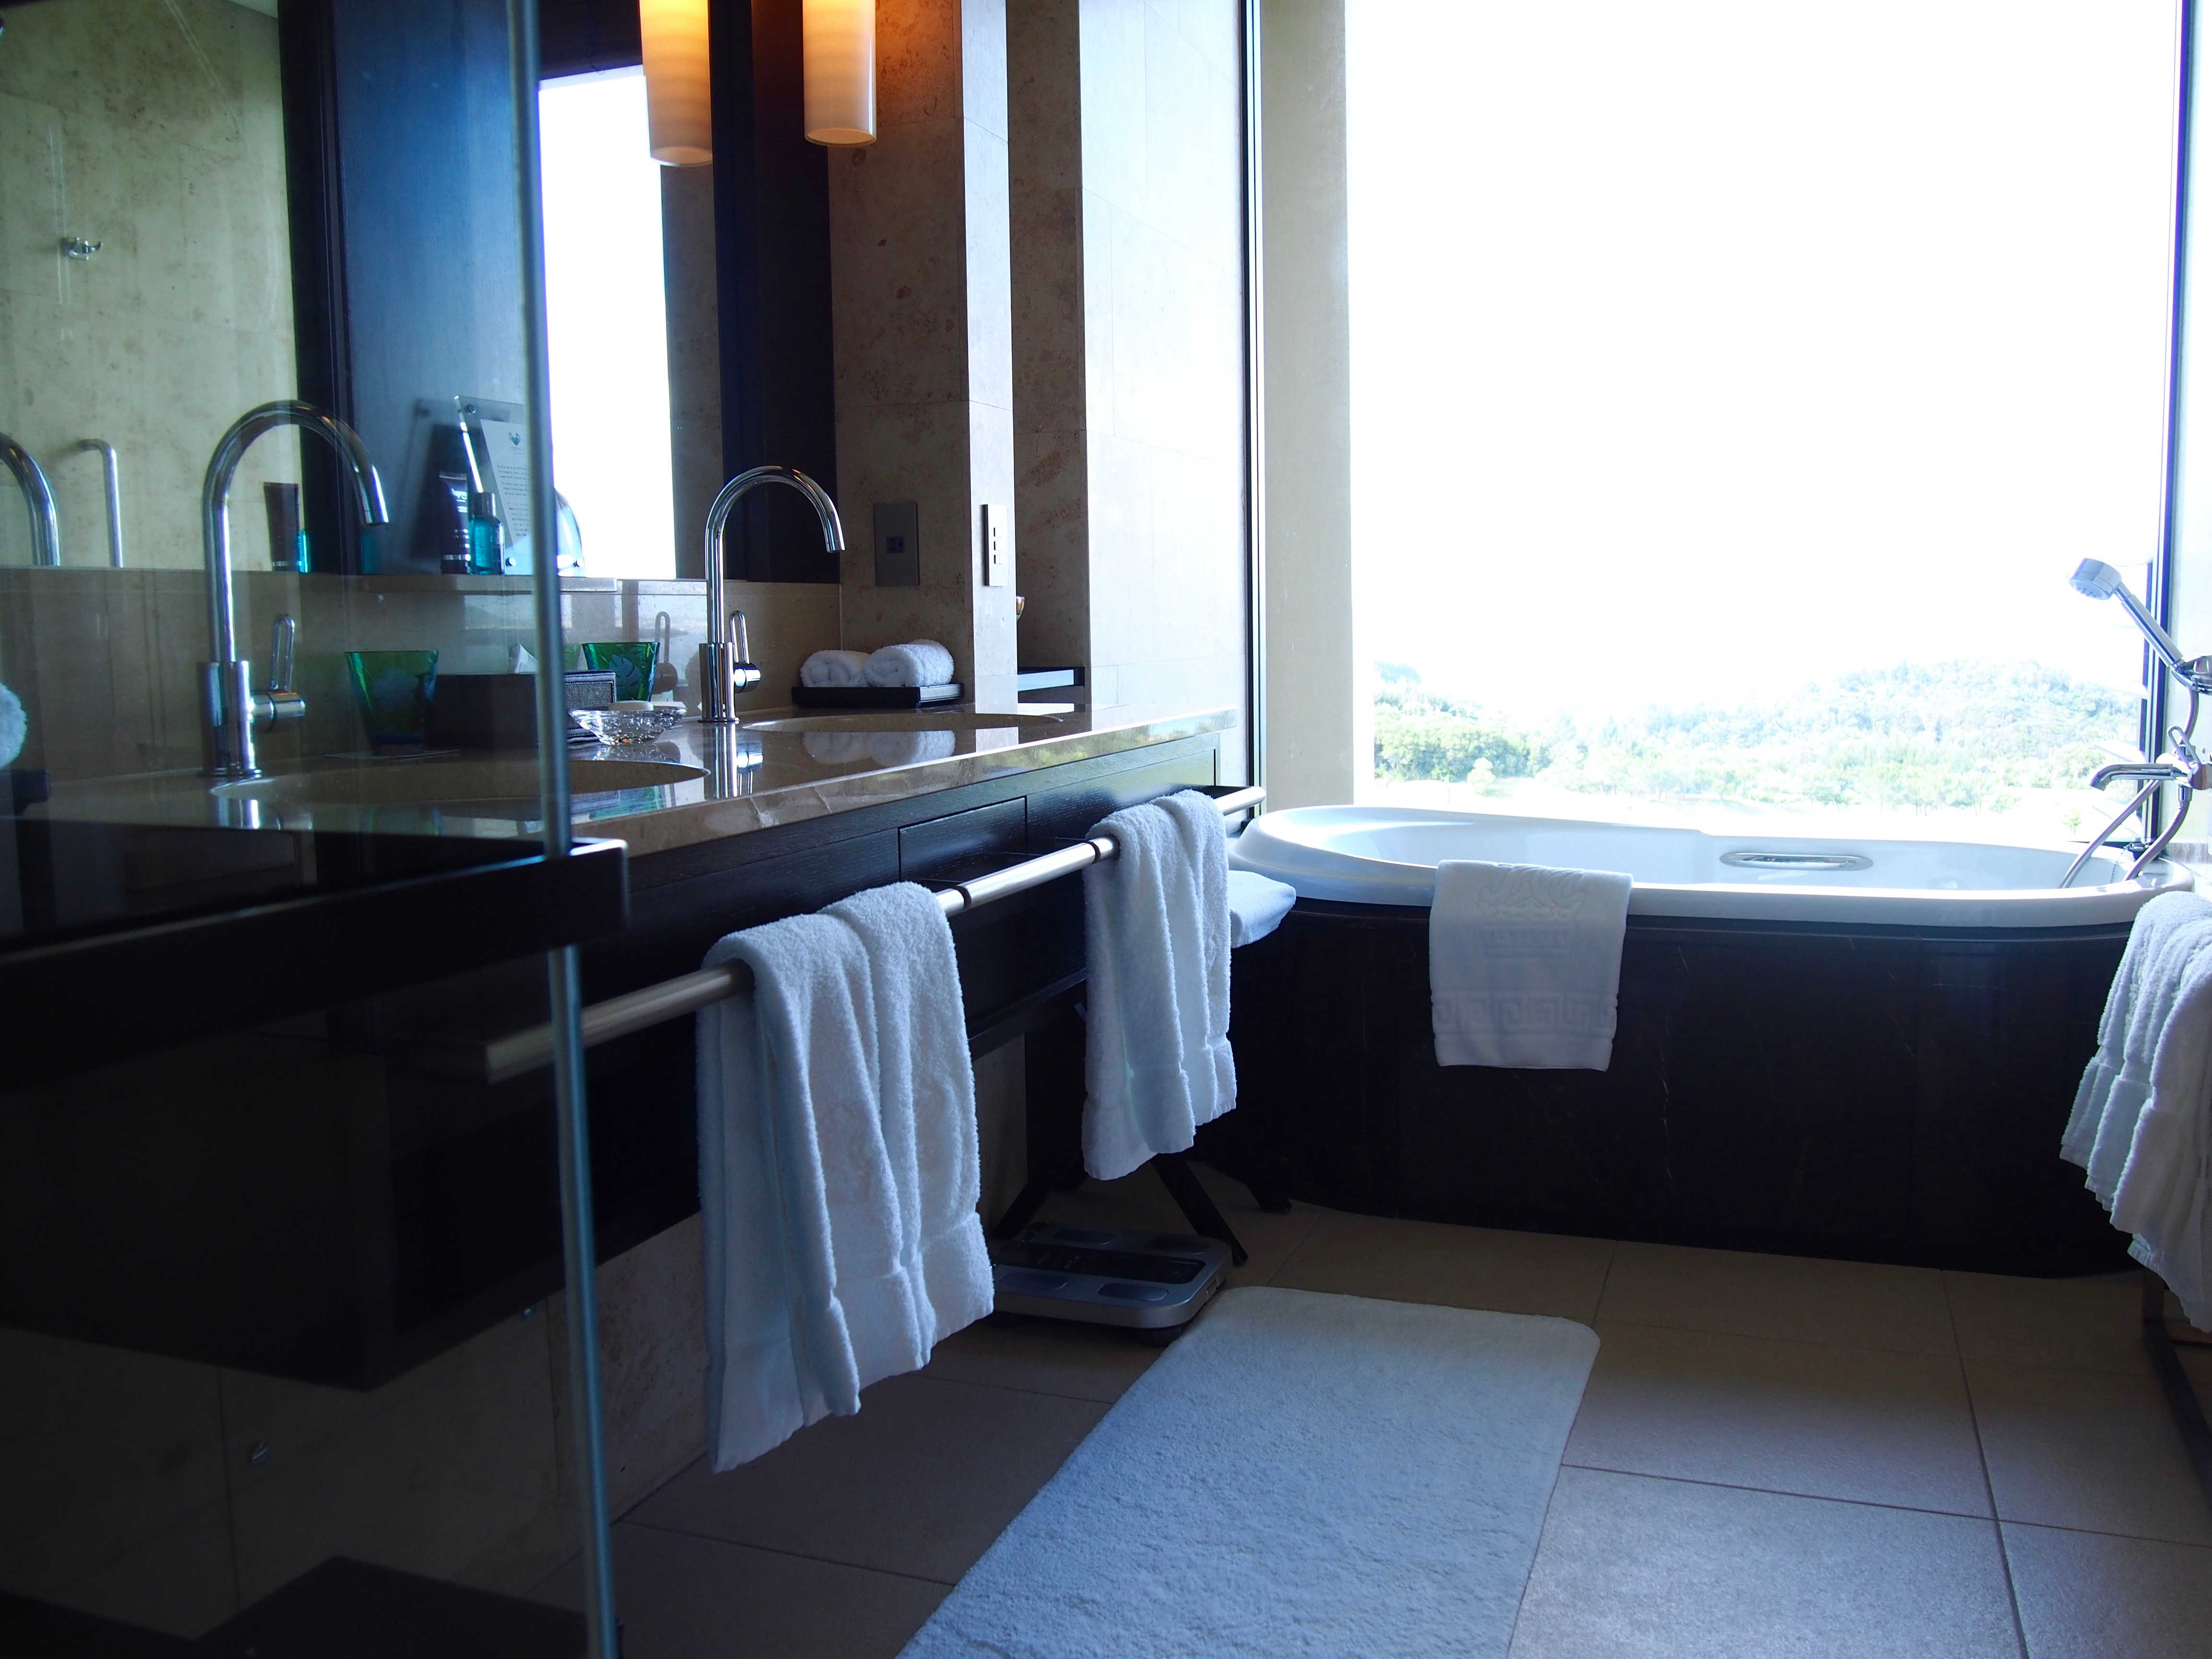 Ritz-Carlton Okinawa bathroom 2